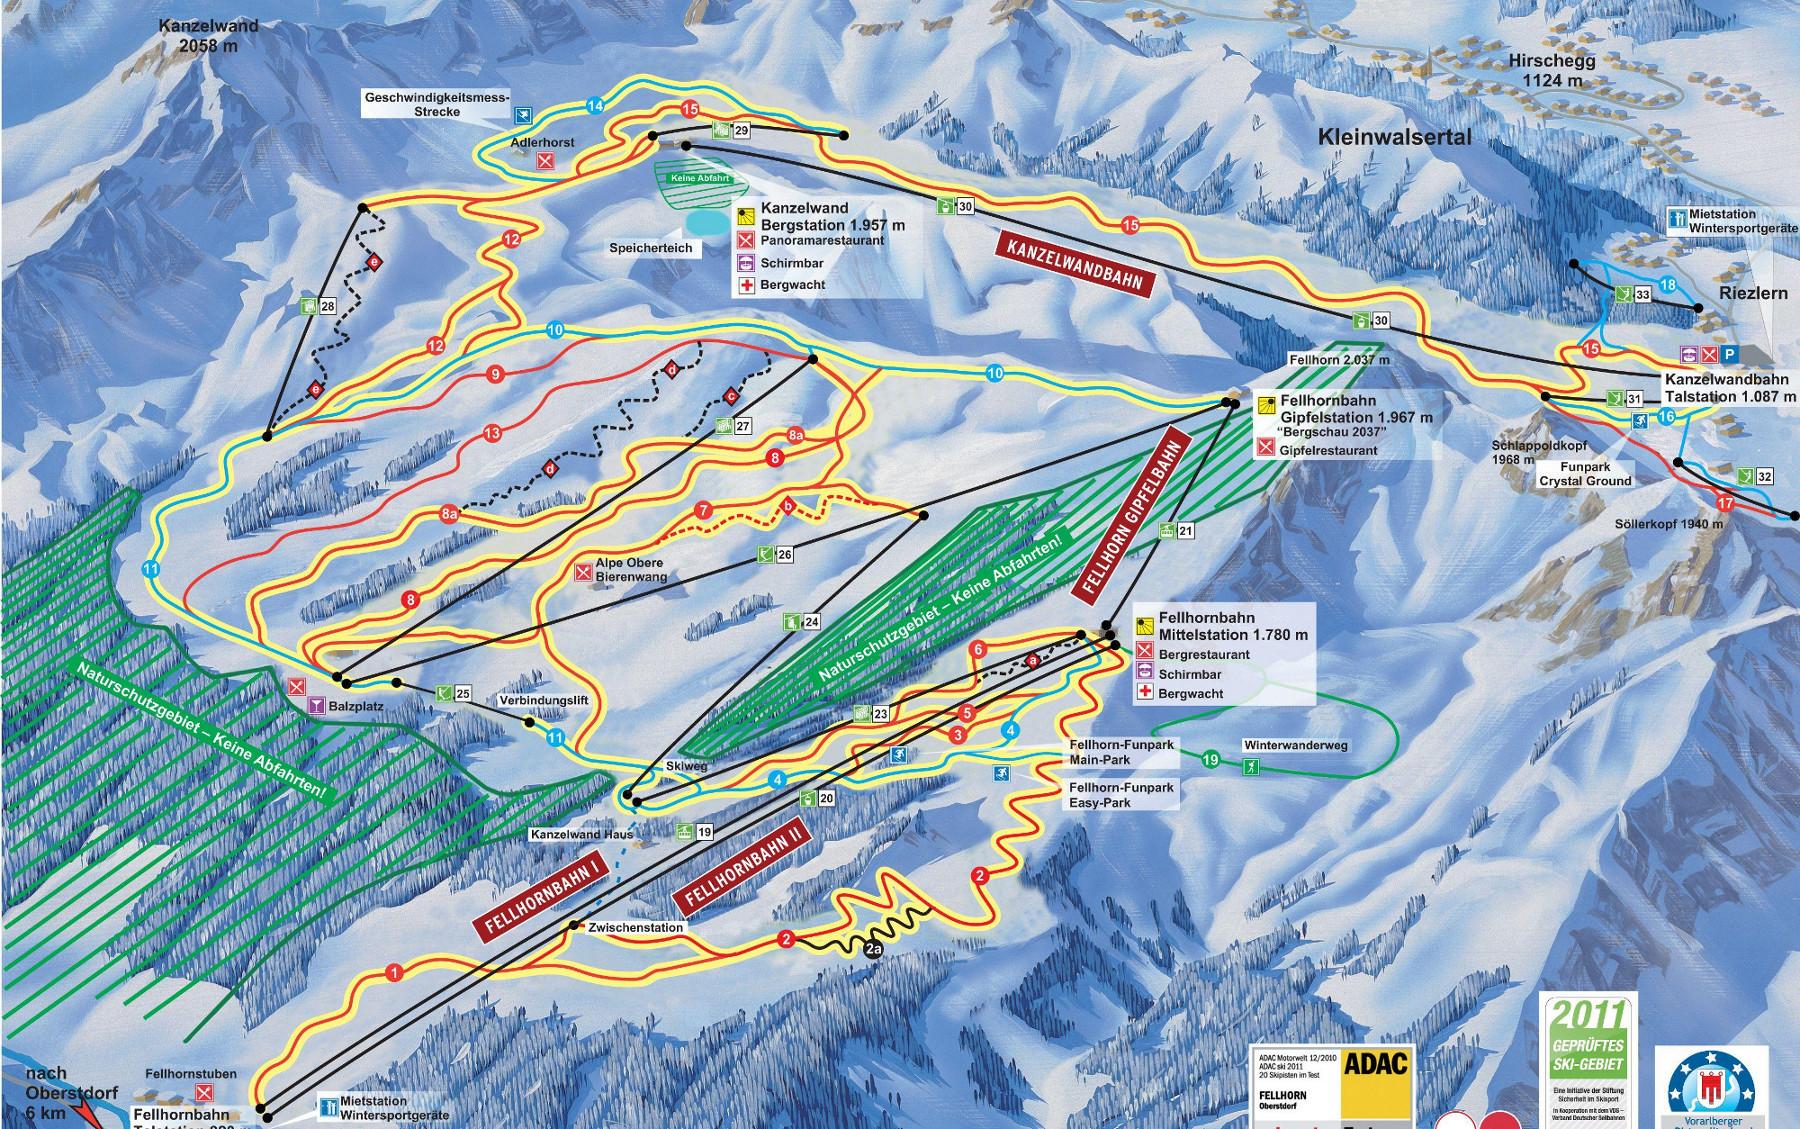 Lyžařská mapa sjezdovek areálu Kanzelwandbahn - Fellhorn